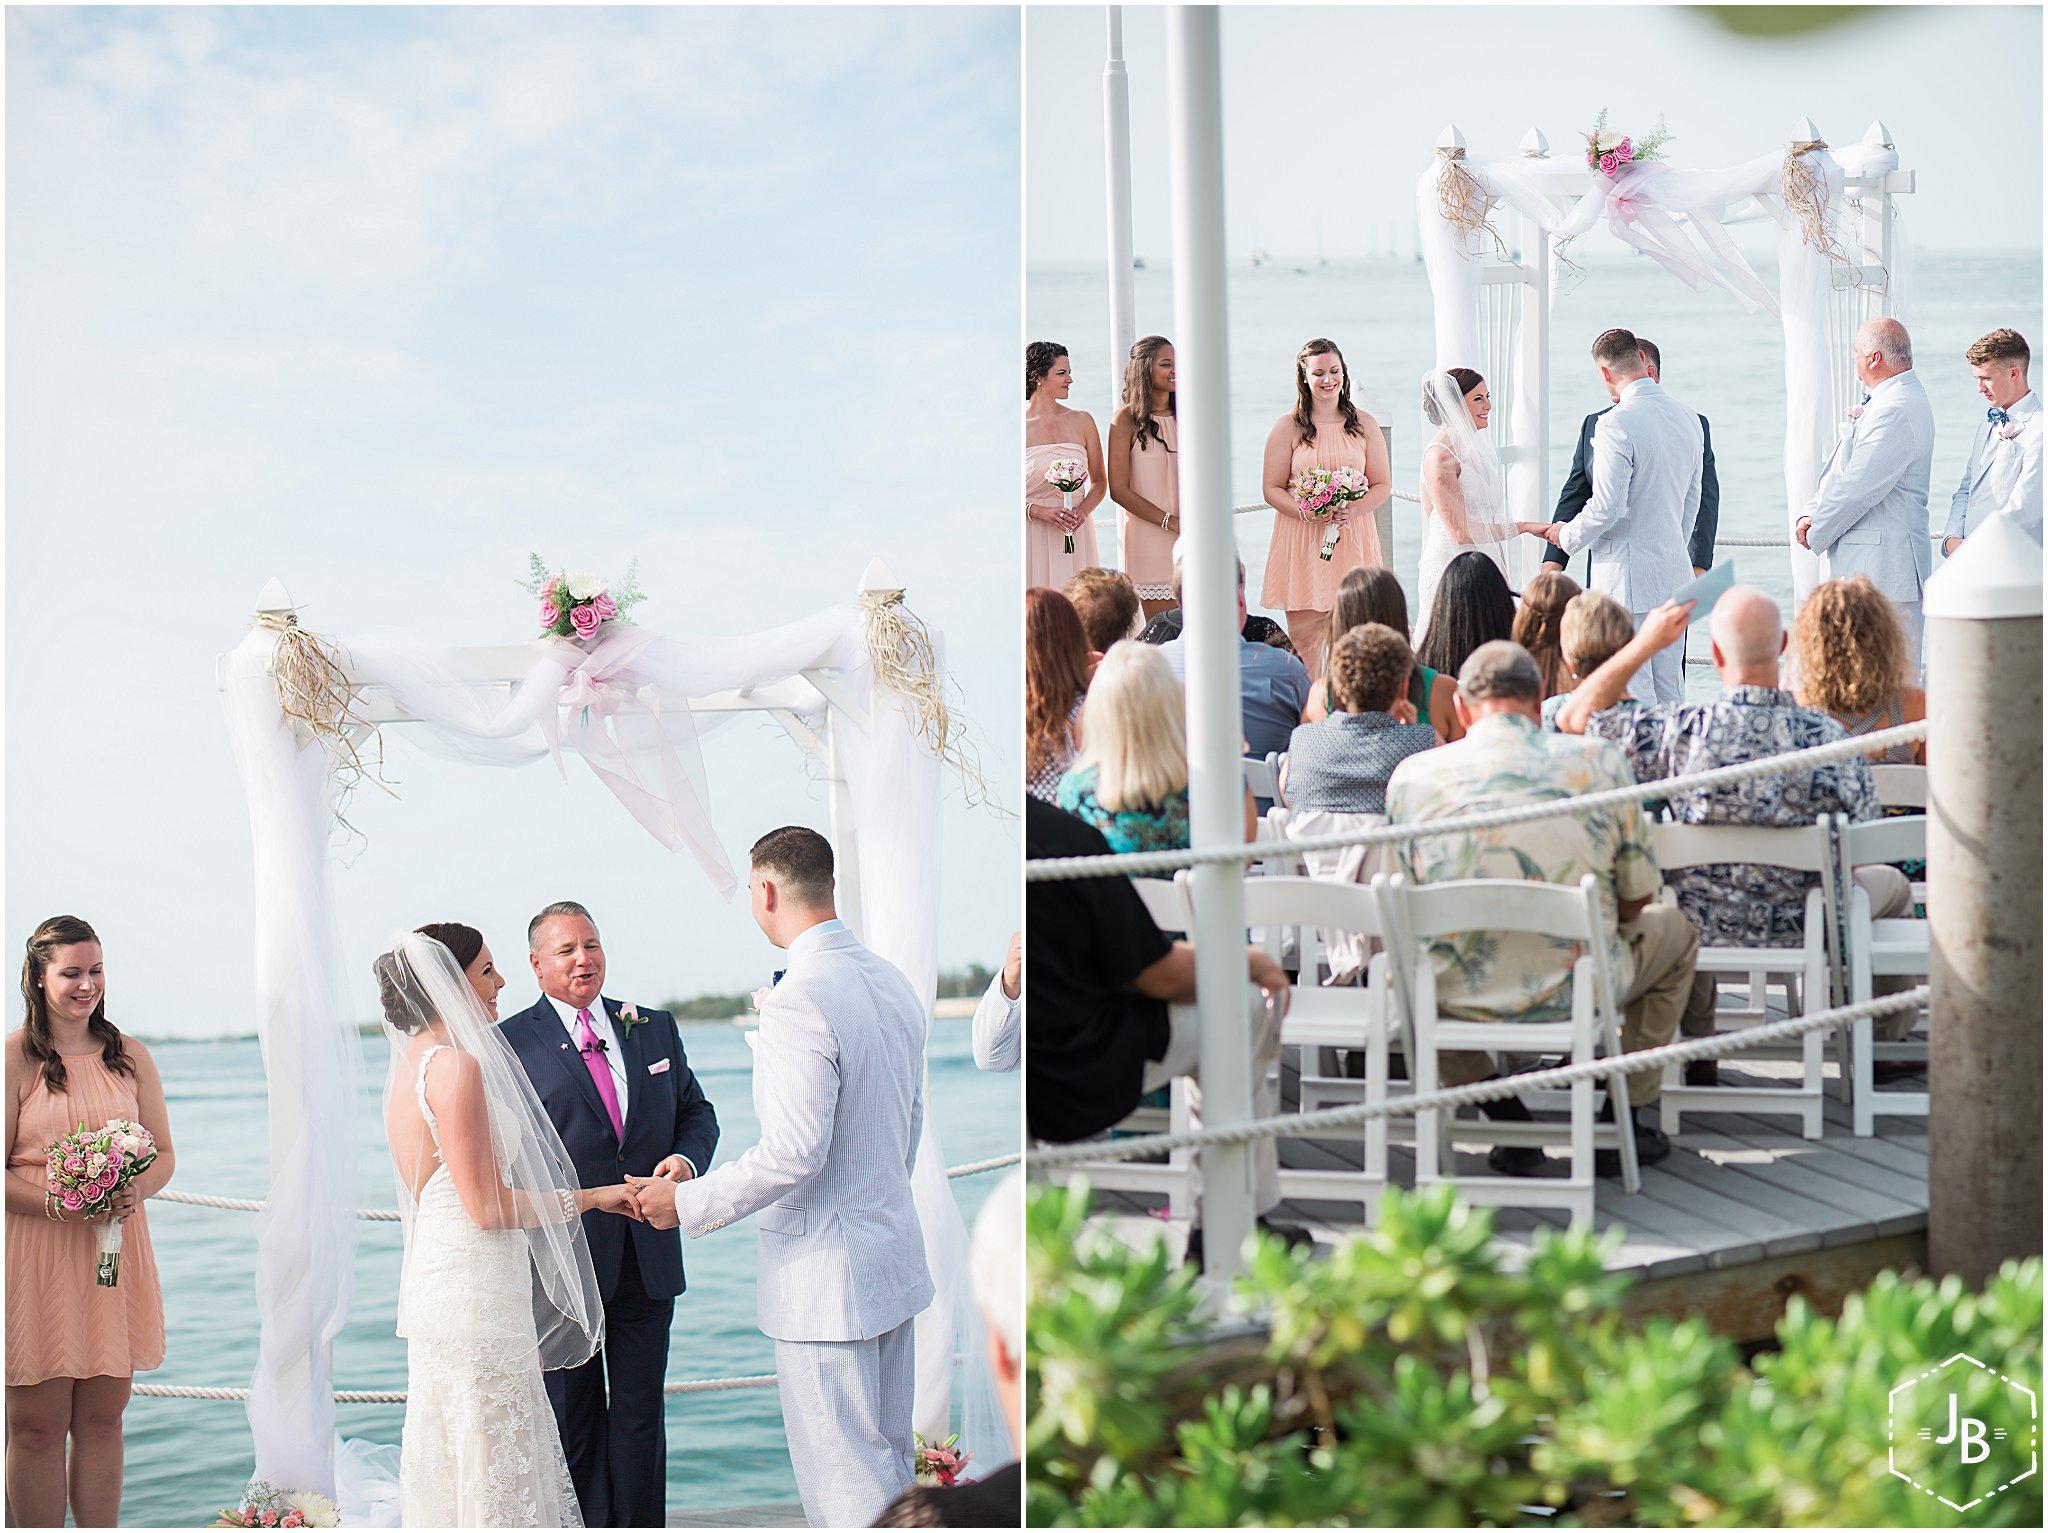 WeddingPhotographerSouthFlorida_0020.jpg